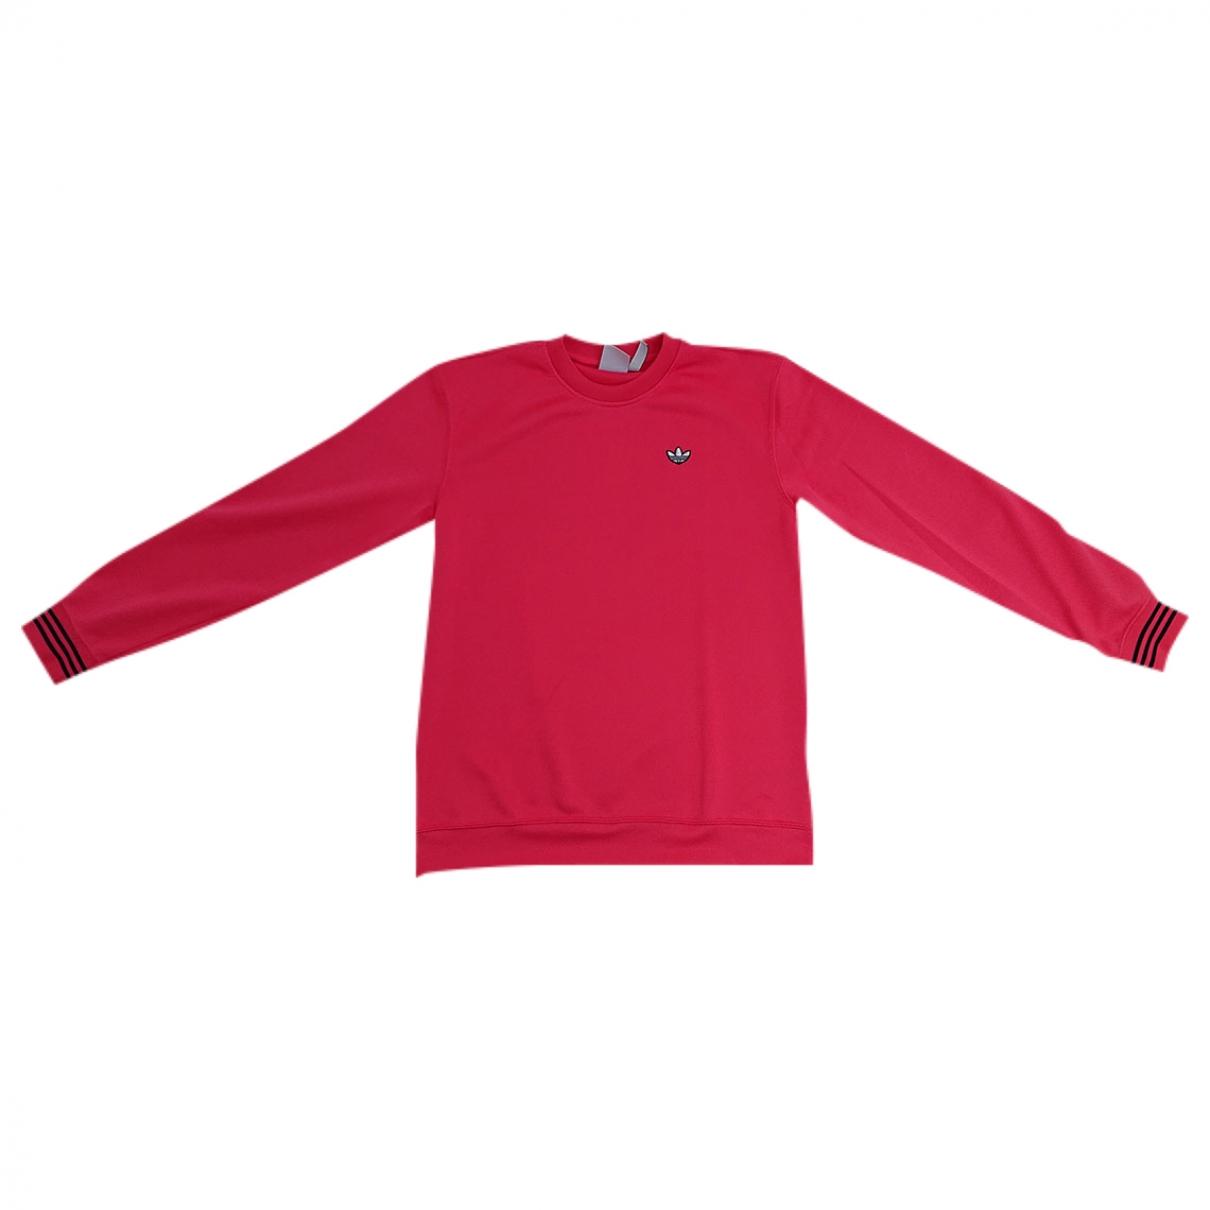 Adidas \N Pink Knitwear & Sweatshirts for Men S International